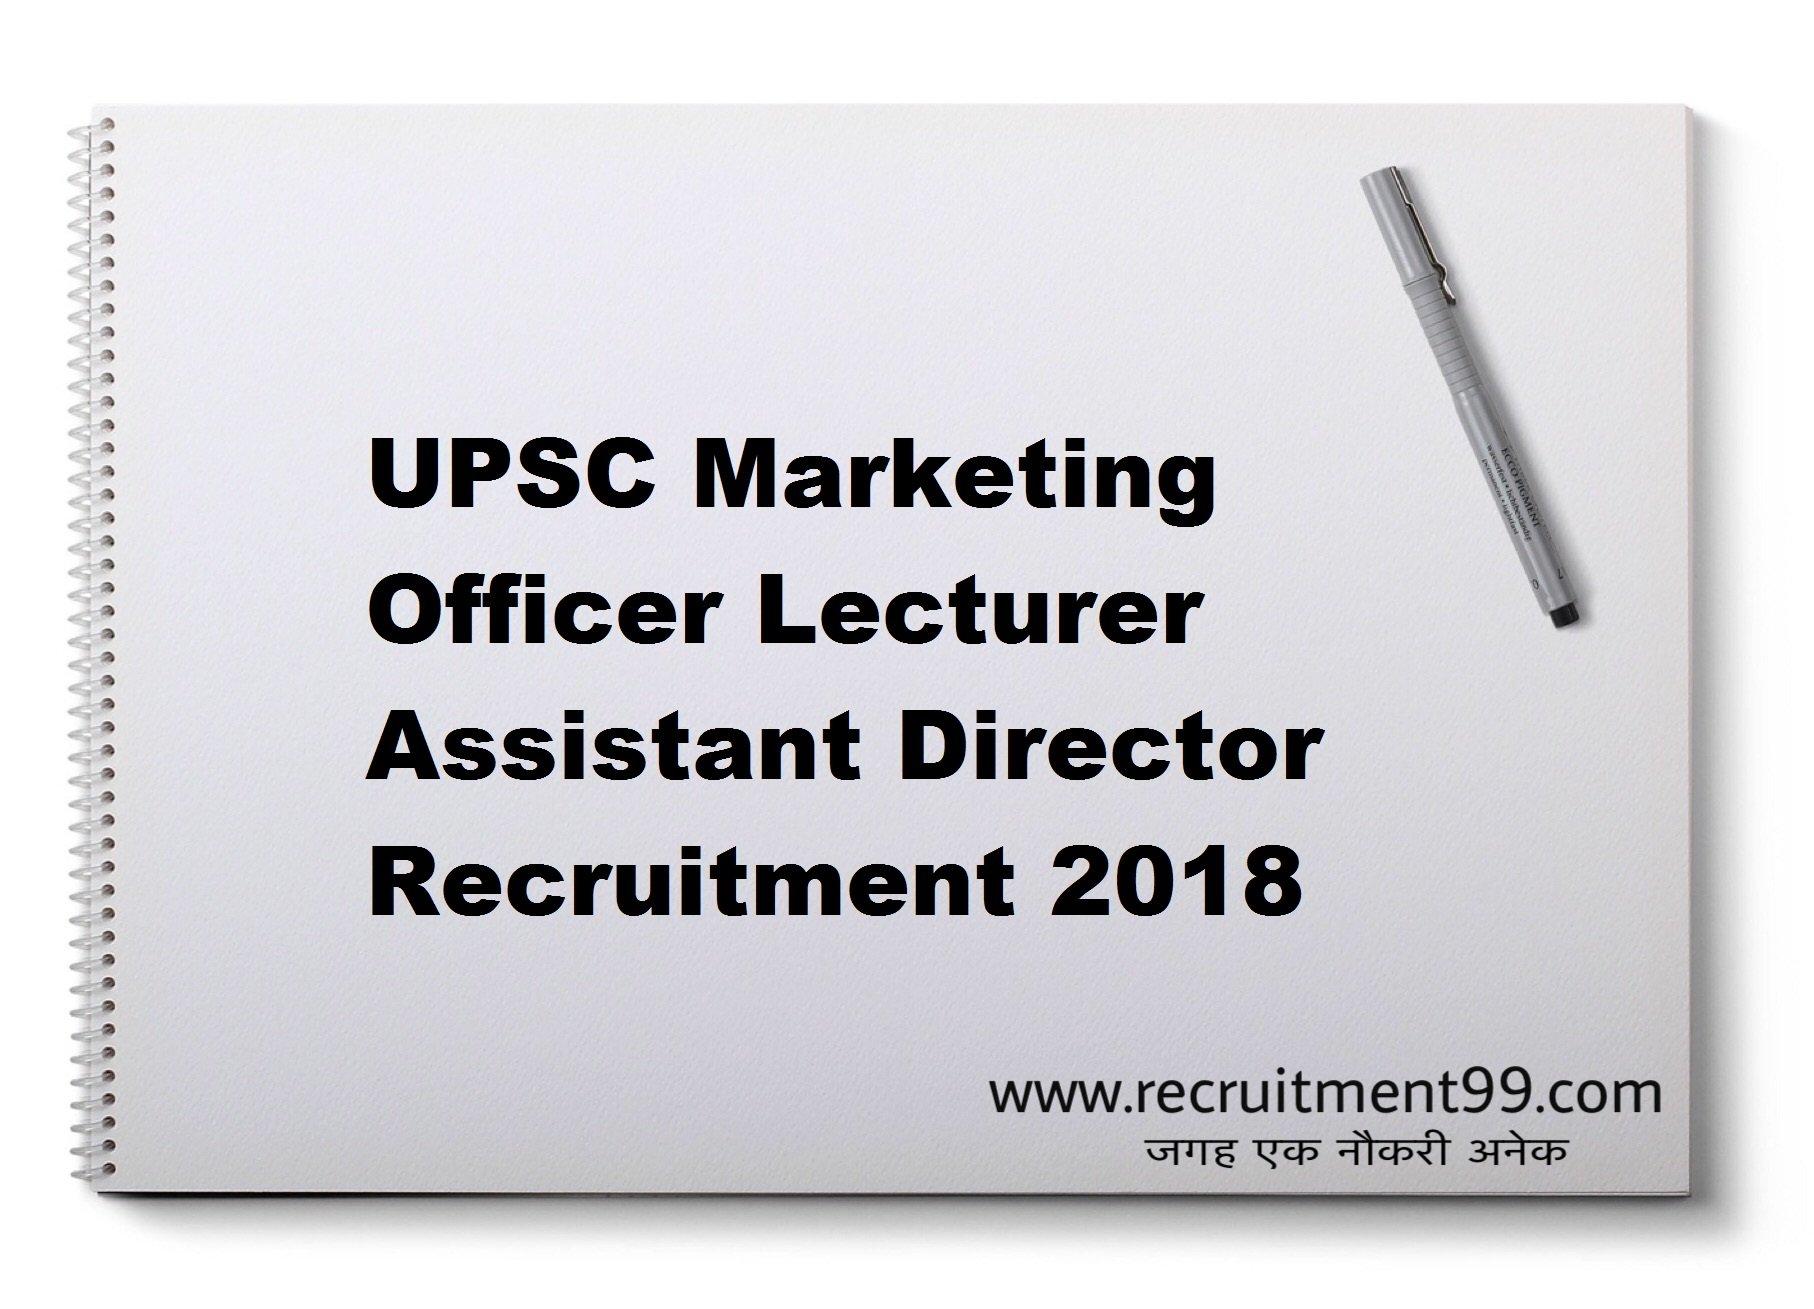 UPSC Marketing Officer Lecturer Assistant Director Recruitment Admit Card Result 2018